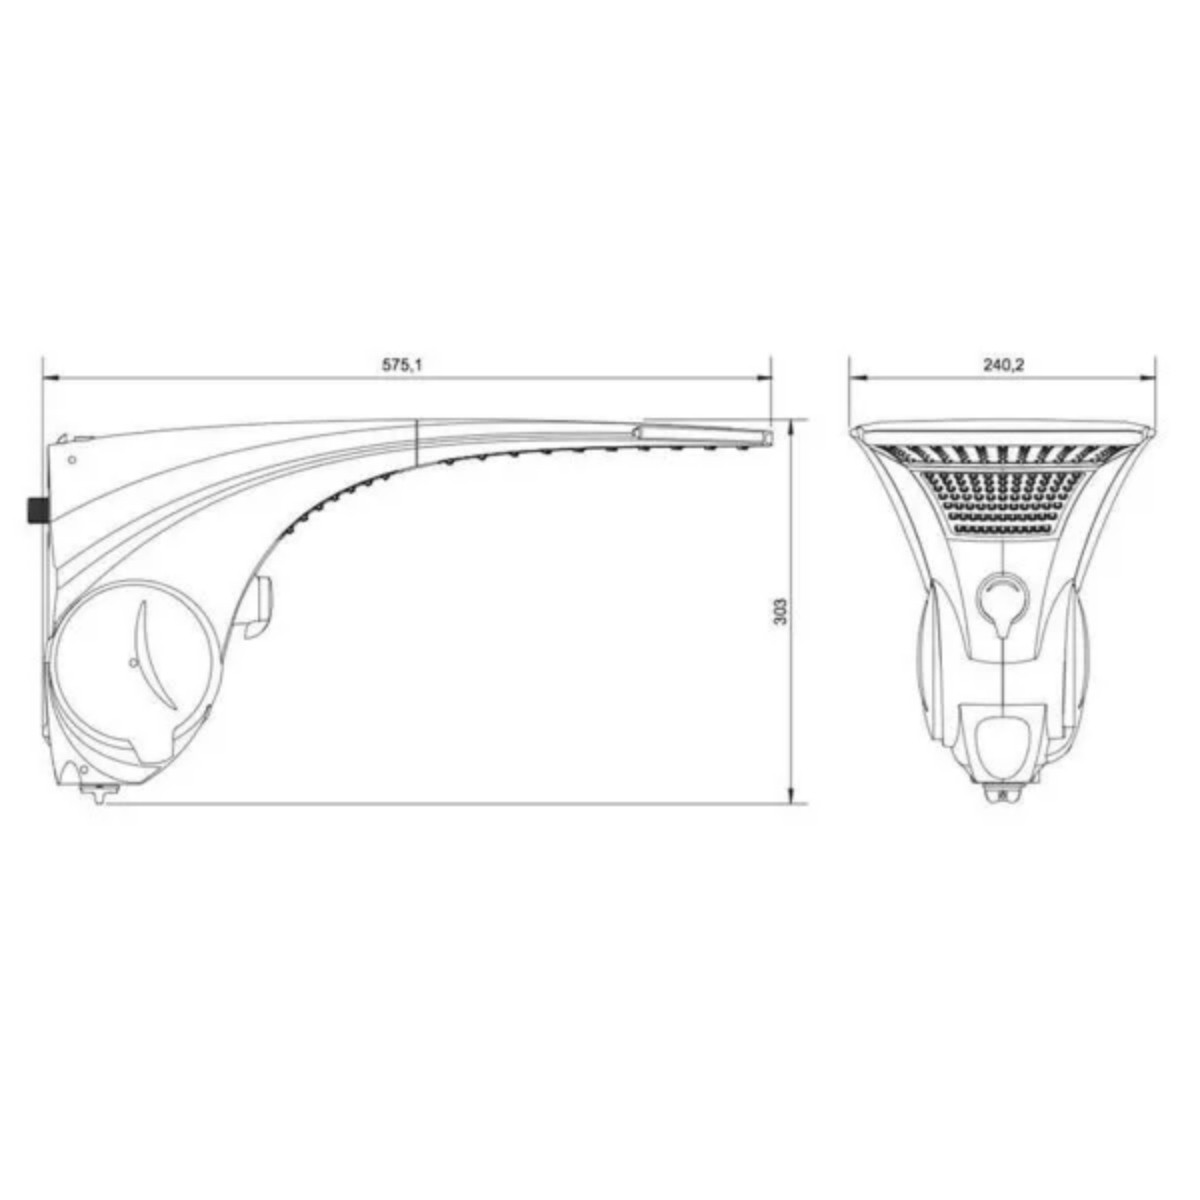 Chuveiro Lorenzetti Duo Shower Quadra Turbo Eletrônico 110v 5500w